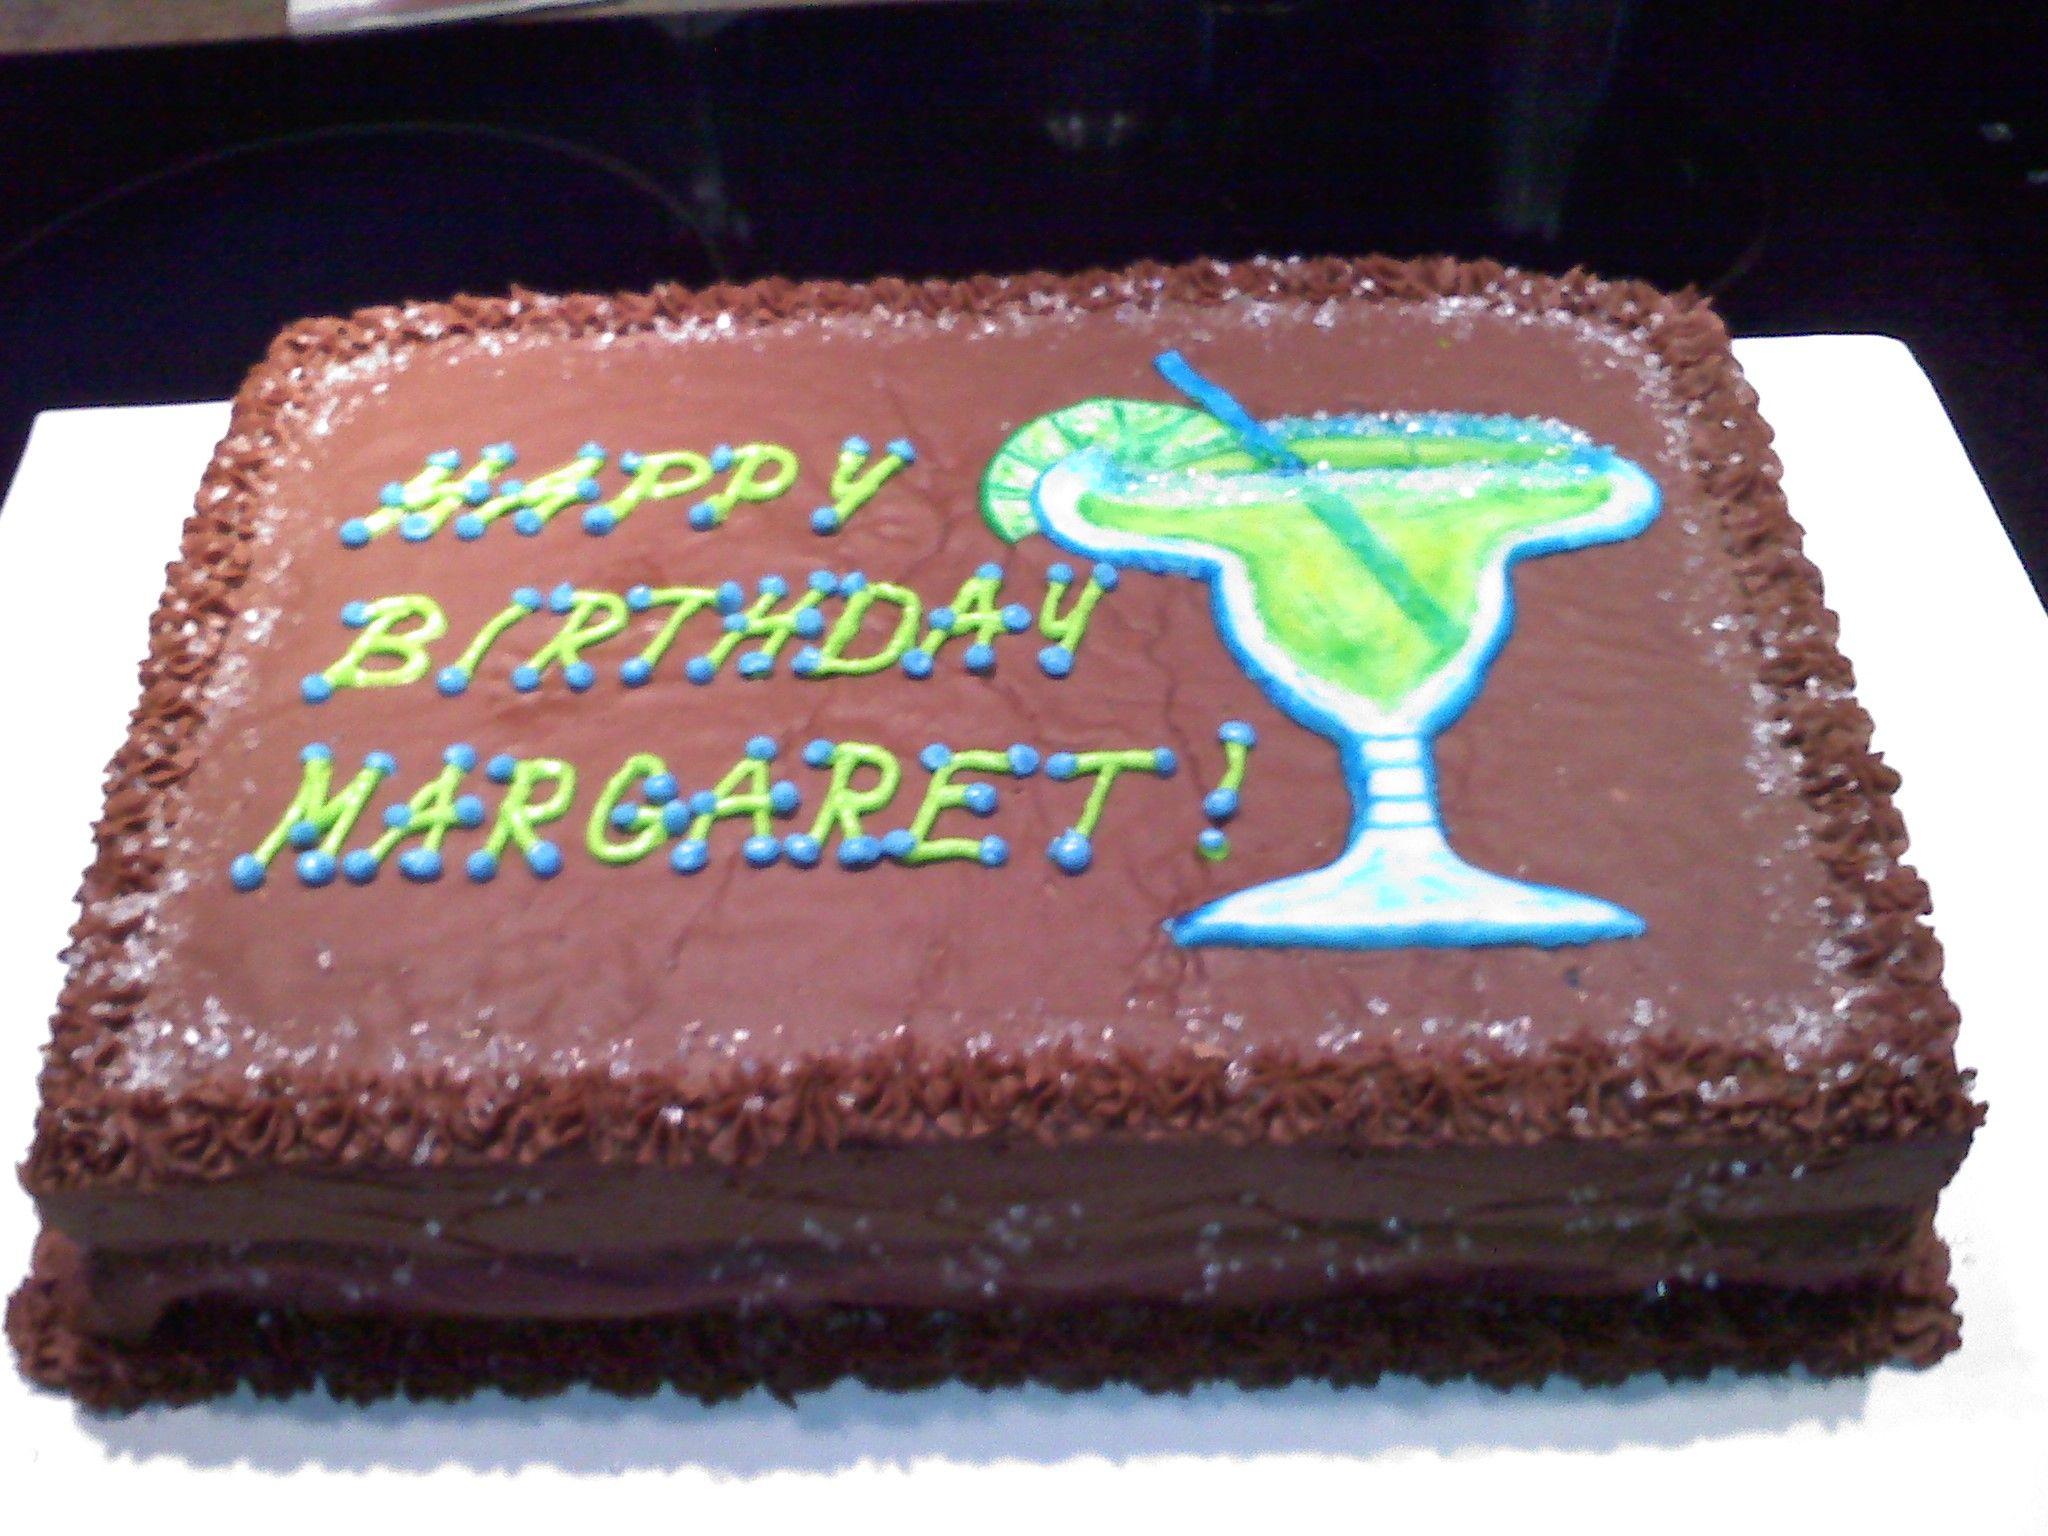 Margarita Cake | My Life | Pinterest